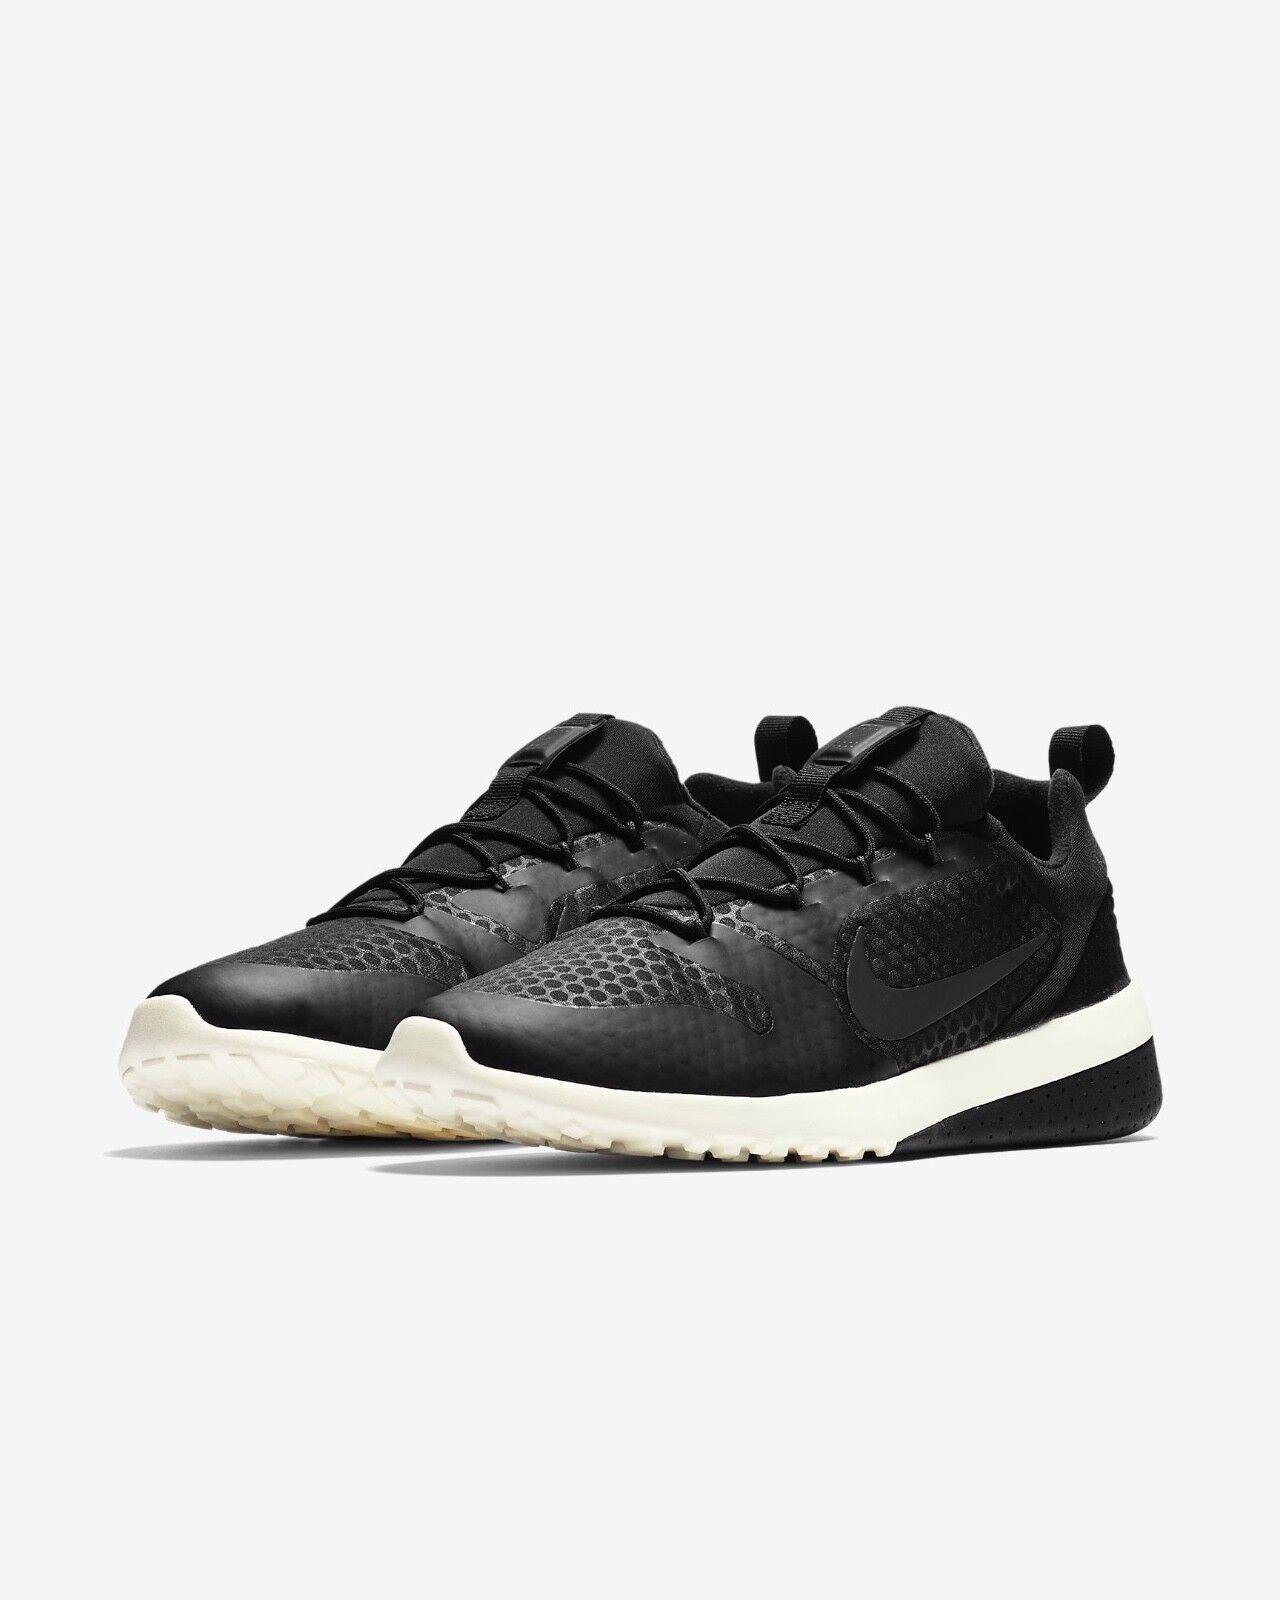 Nike CK Racer Running Shoes Elite Low Black Men Size 10